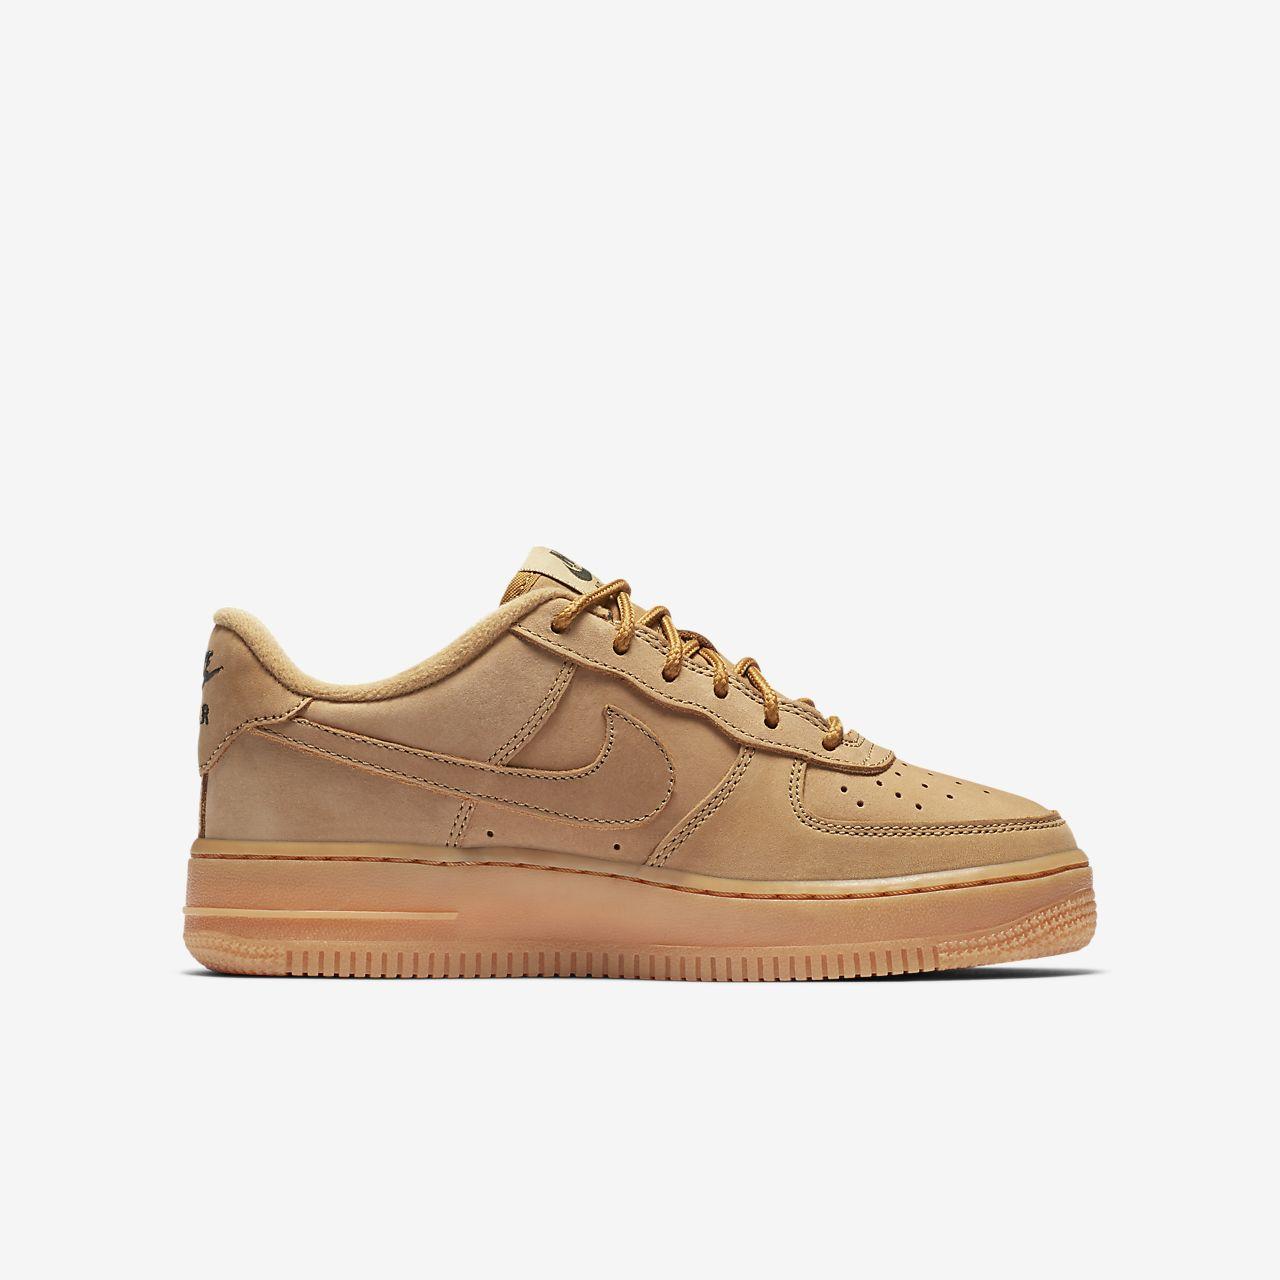 nike air force 1 kids' shoe high top